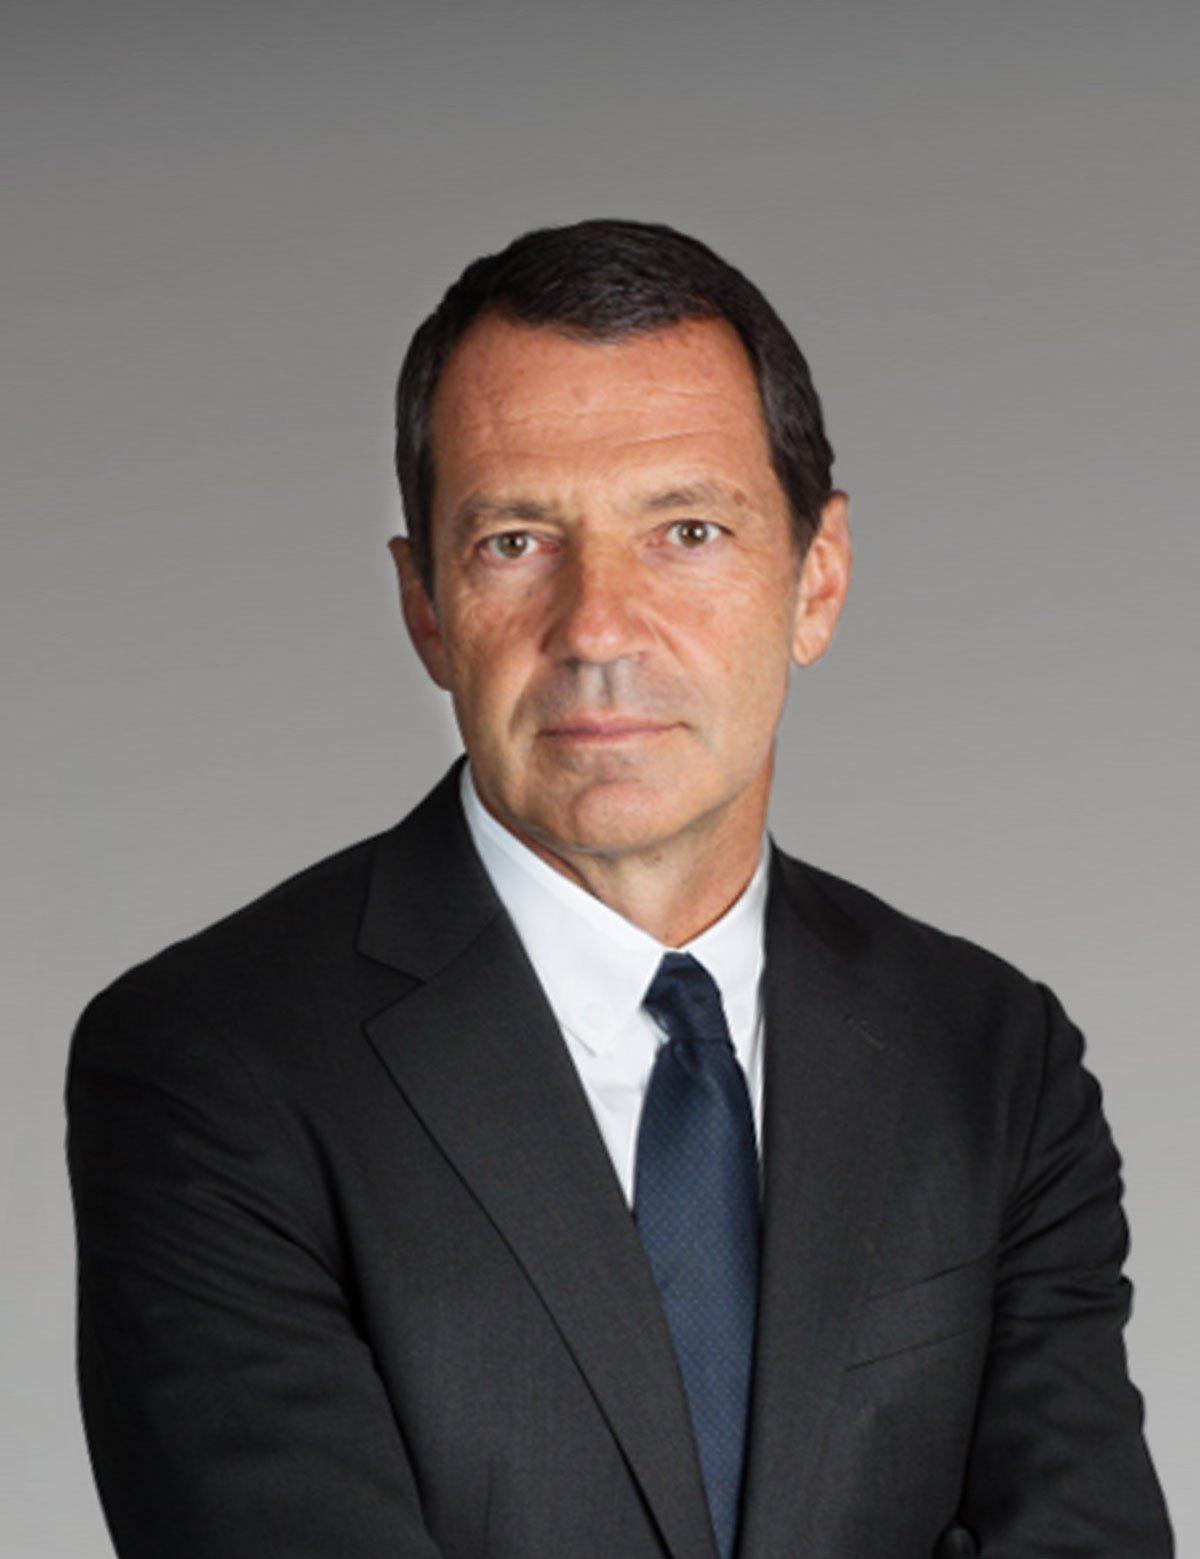 Mr. Franck Charles-Antoine Cancelloni